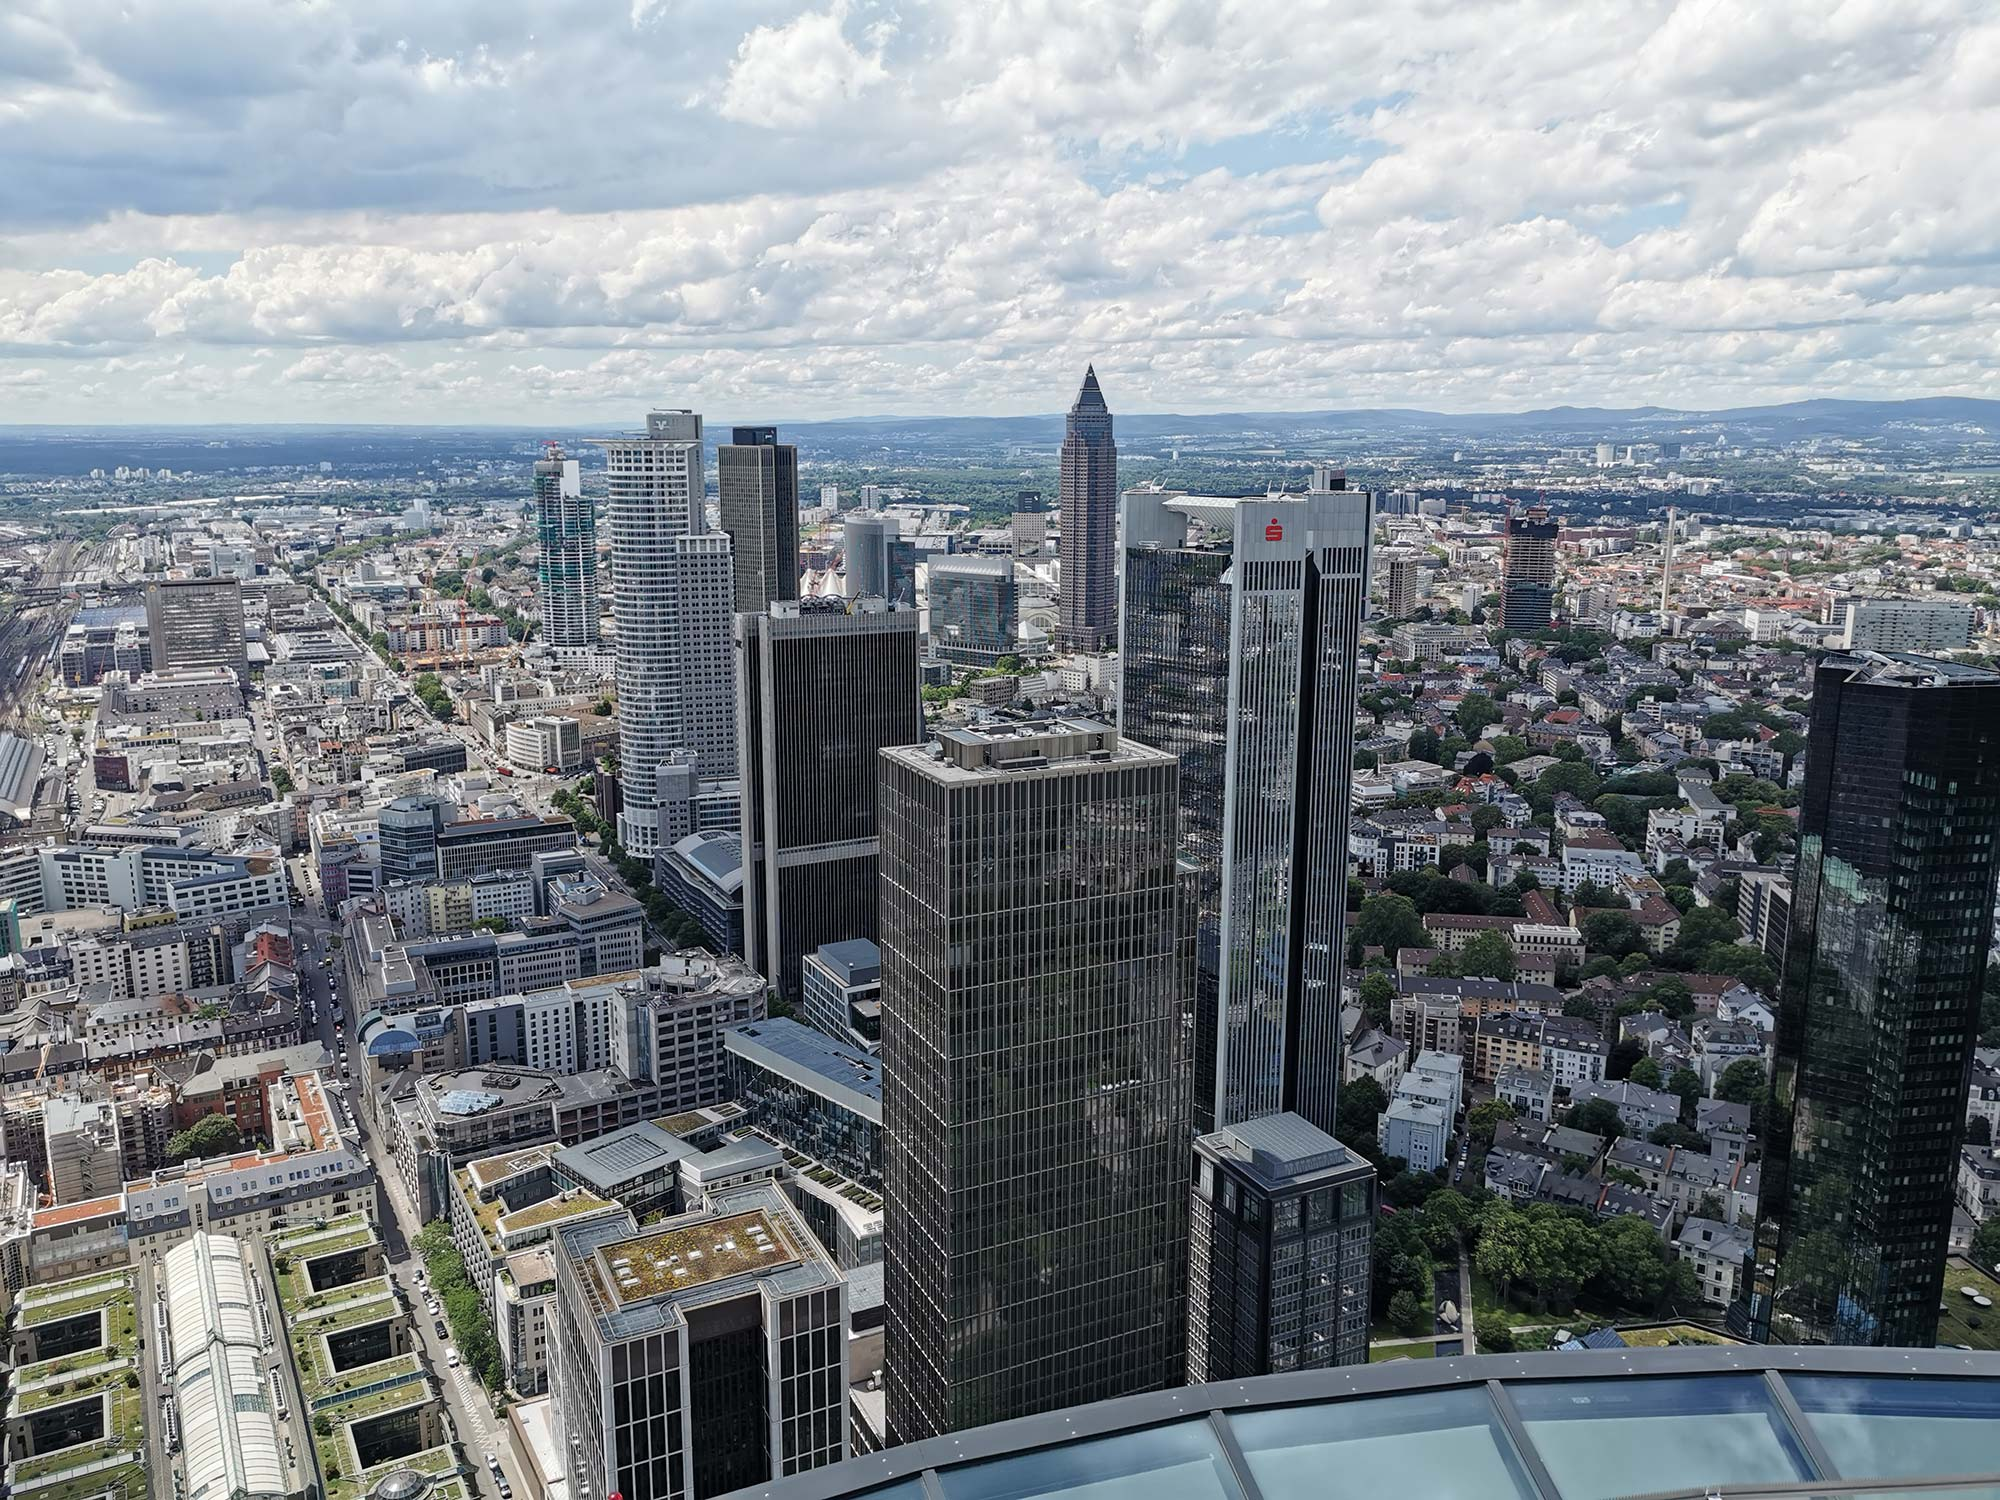 Stadtpanorama - Blick vom MAIN TOWER aus über Frankfurt am Main - Panorama Skyline Frankfurt